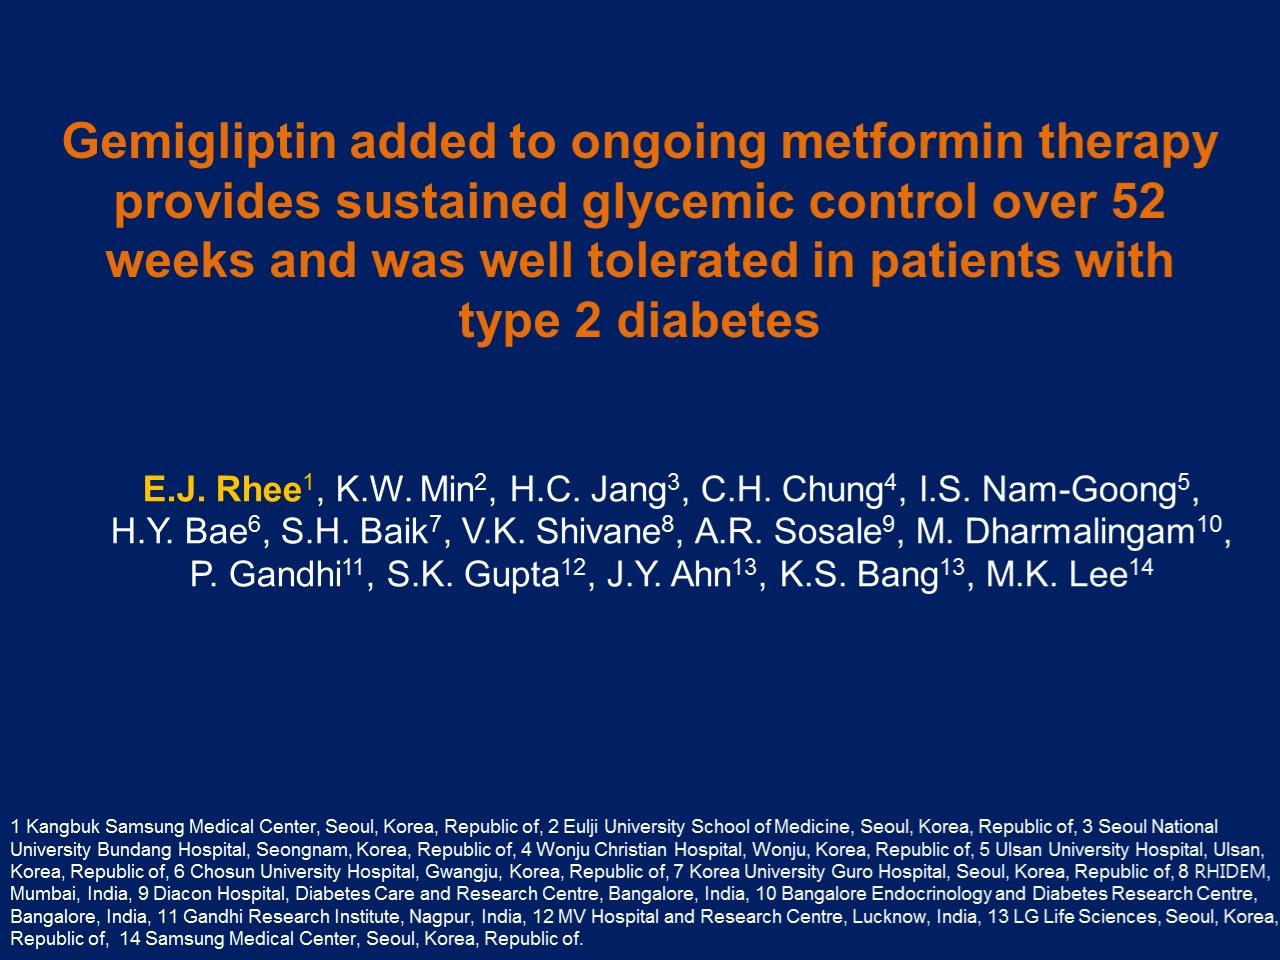 cura de diabetes gemigliptin